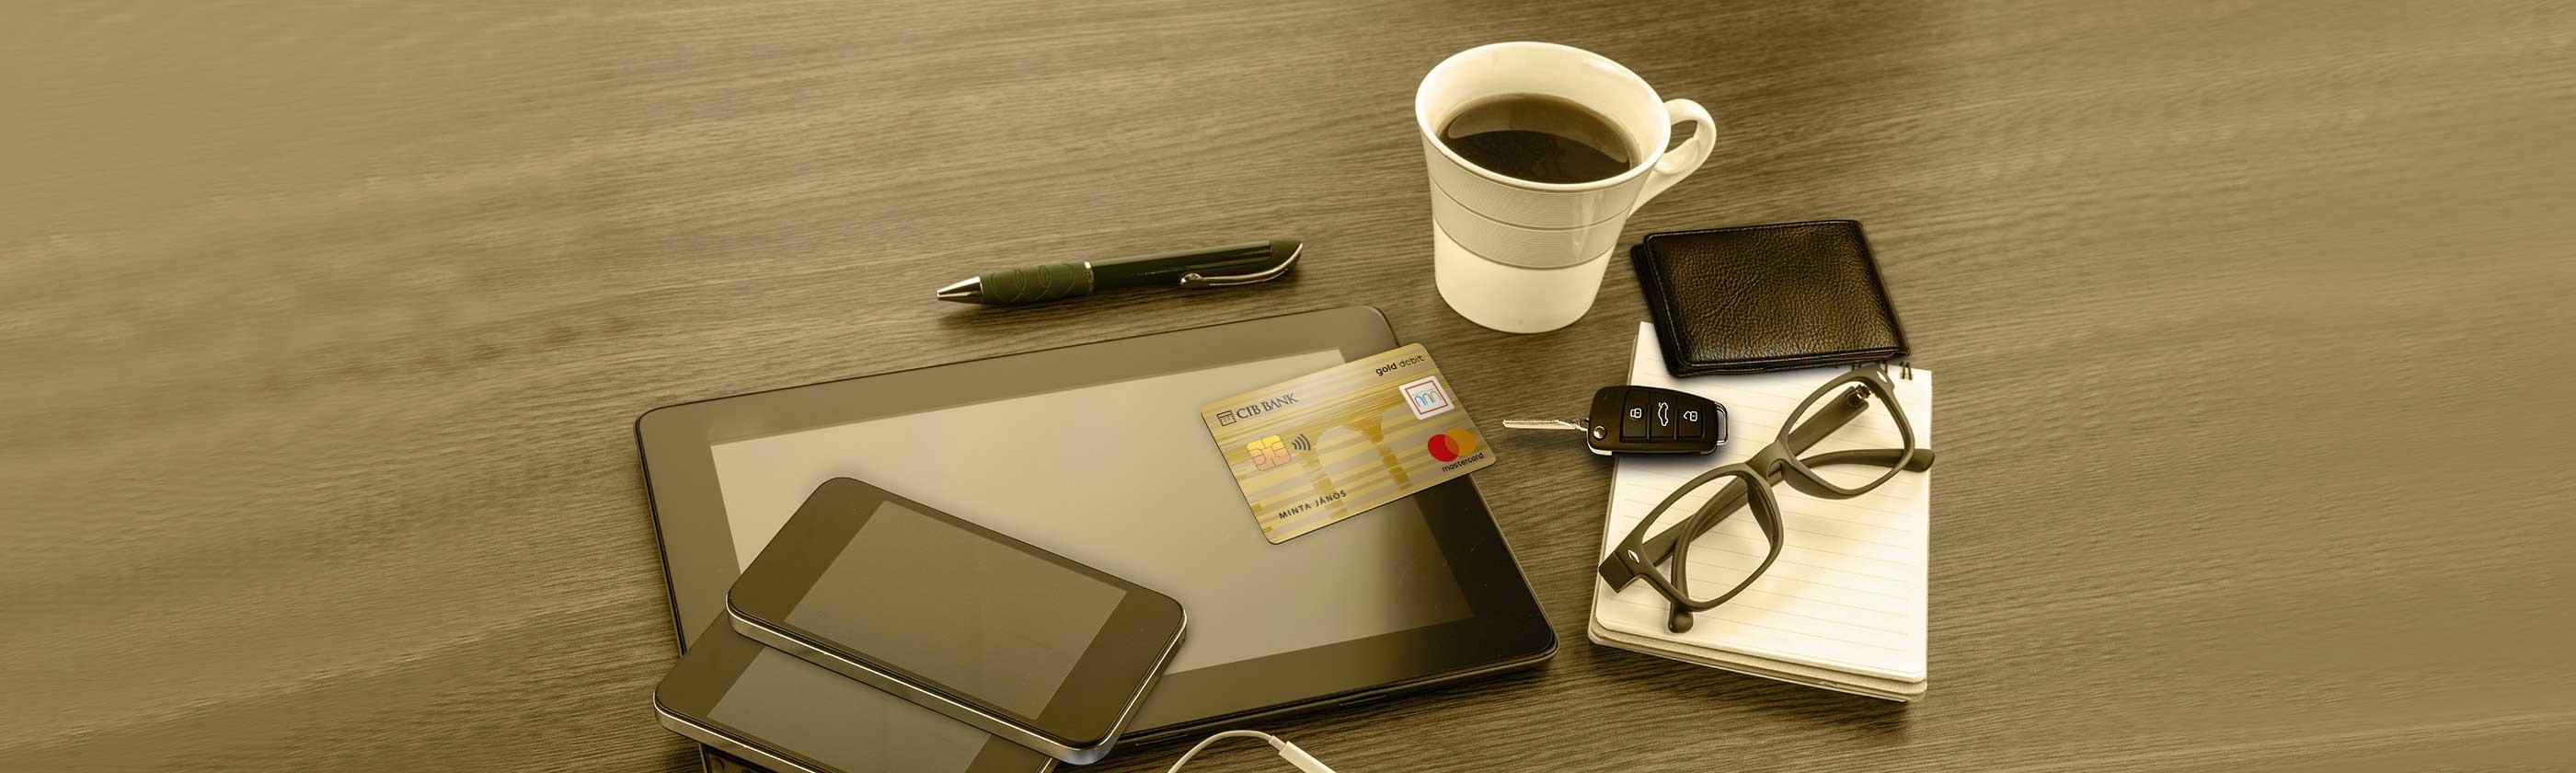 CIB Mastercard Gold debit bankcard